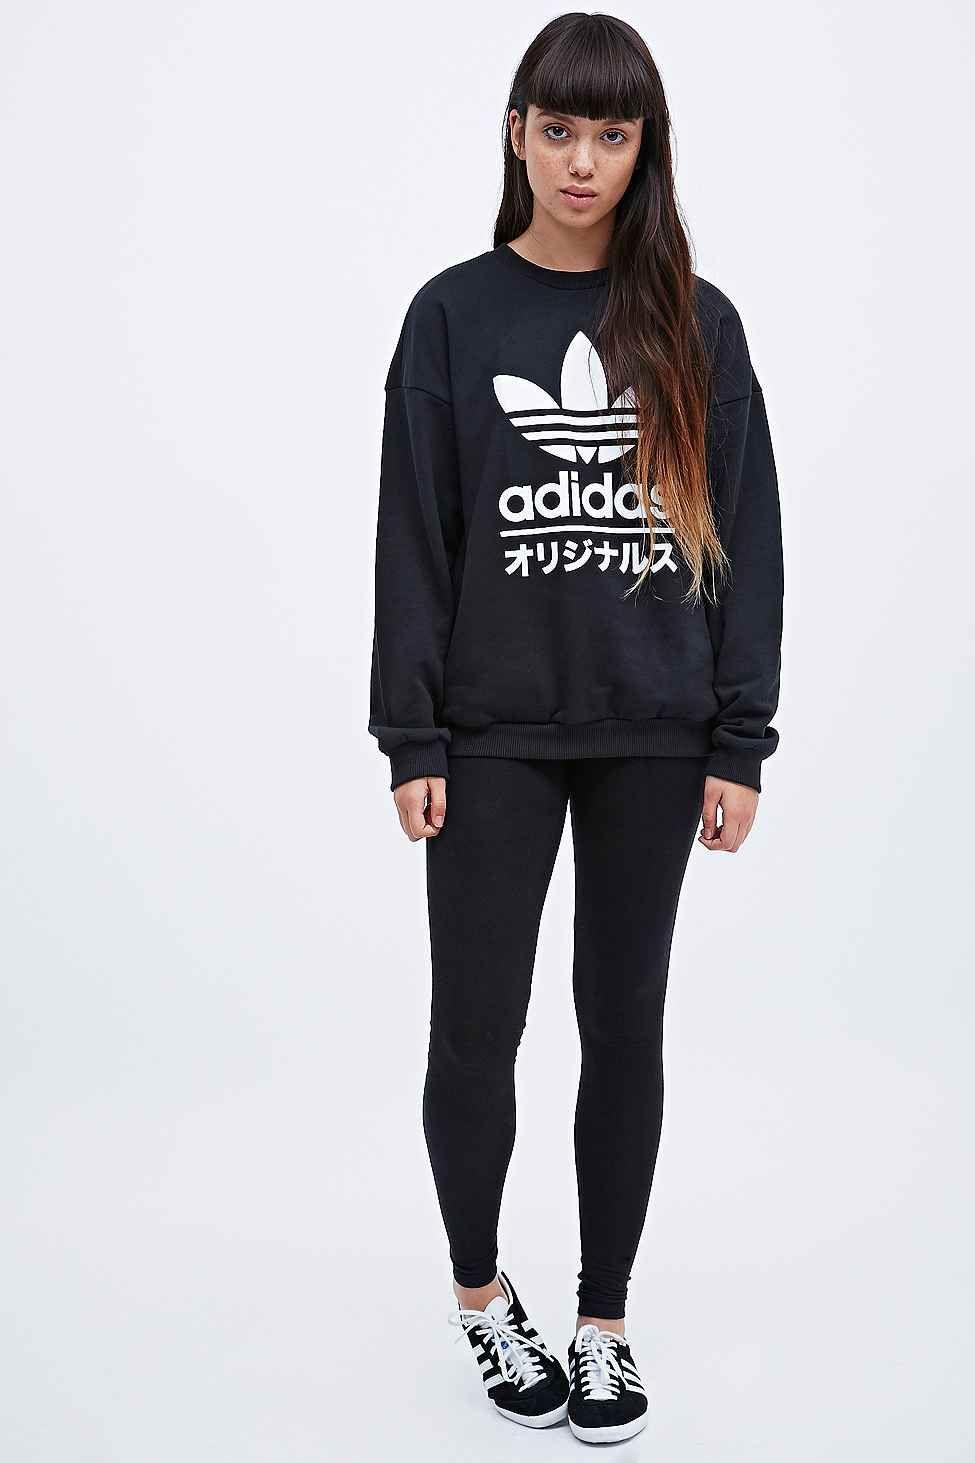 Adidas Typo Sweatshirt In Black Tenue Adidas Idees De Mode [ 1463 x 975 Pixel ]